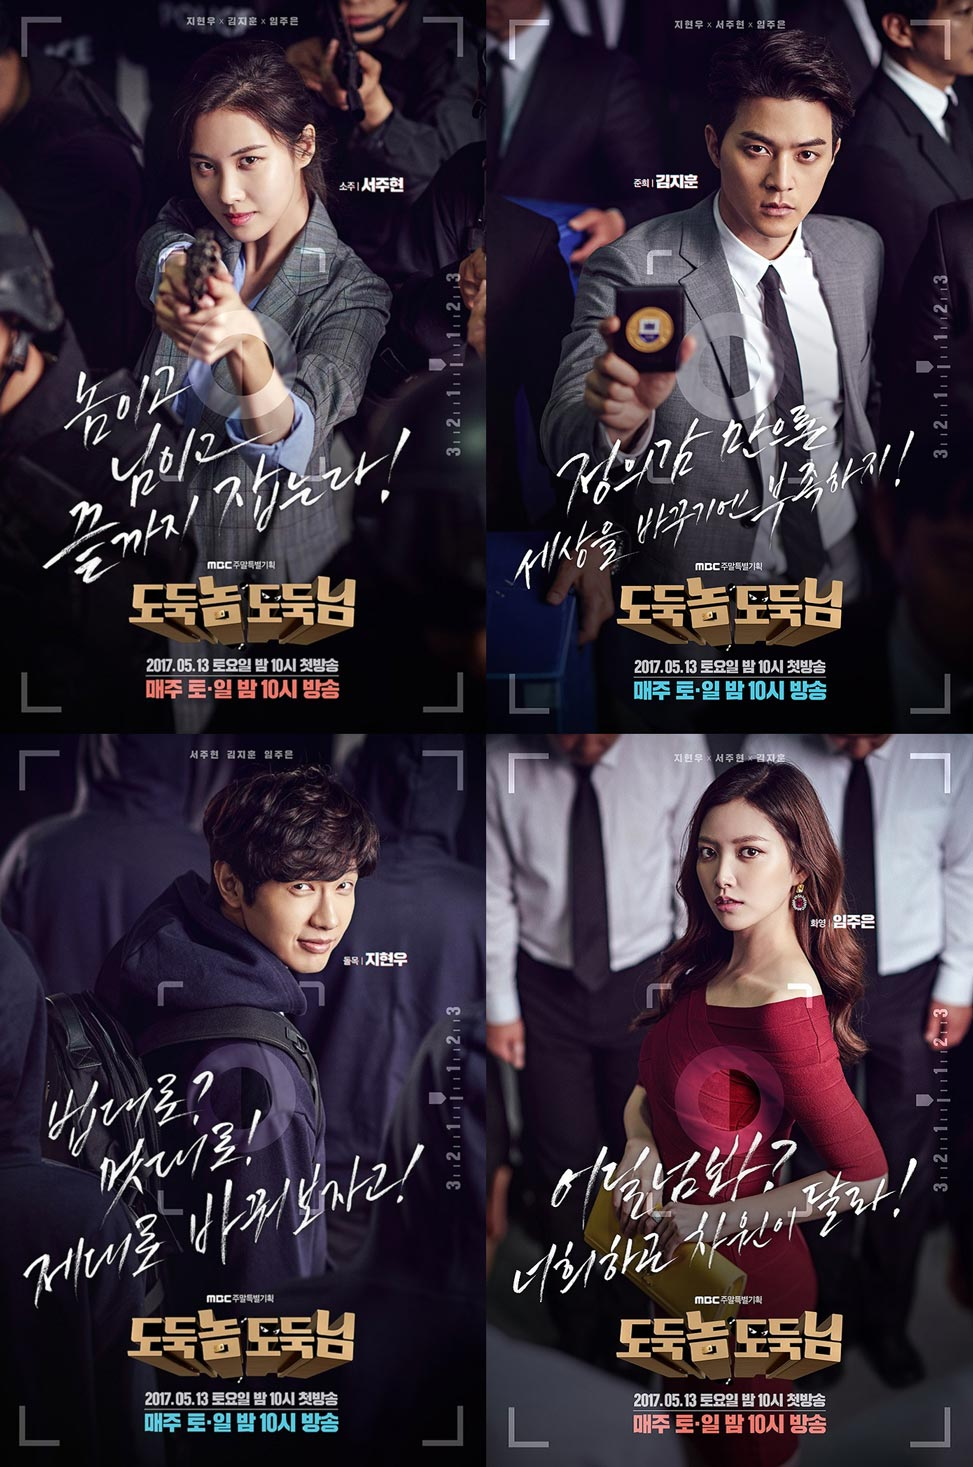 Drama Korea Bad Thief Good Thief 2017 Sub indo - Dramakorea4all